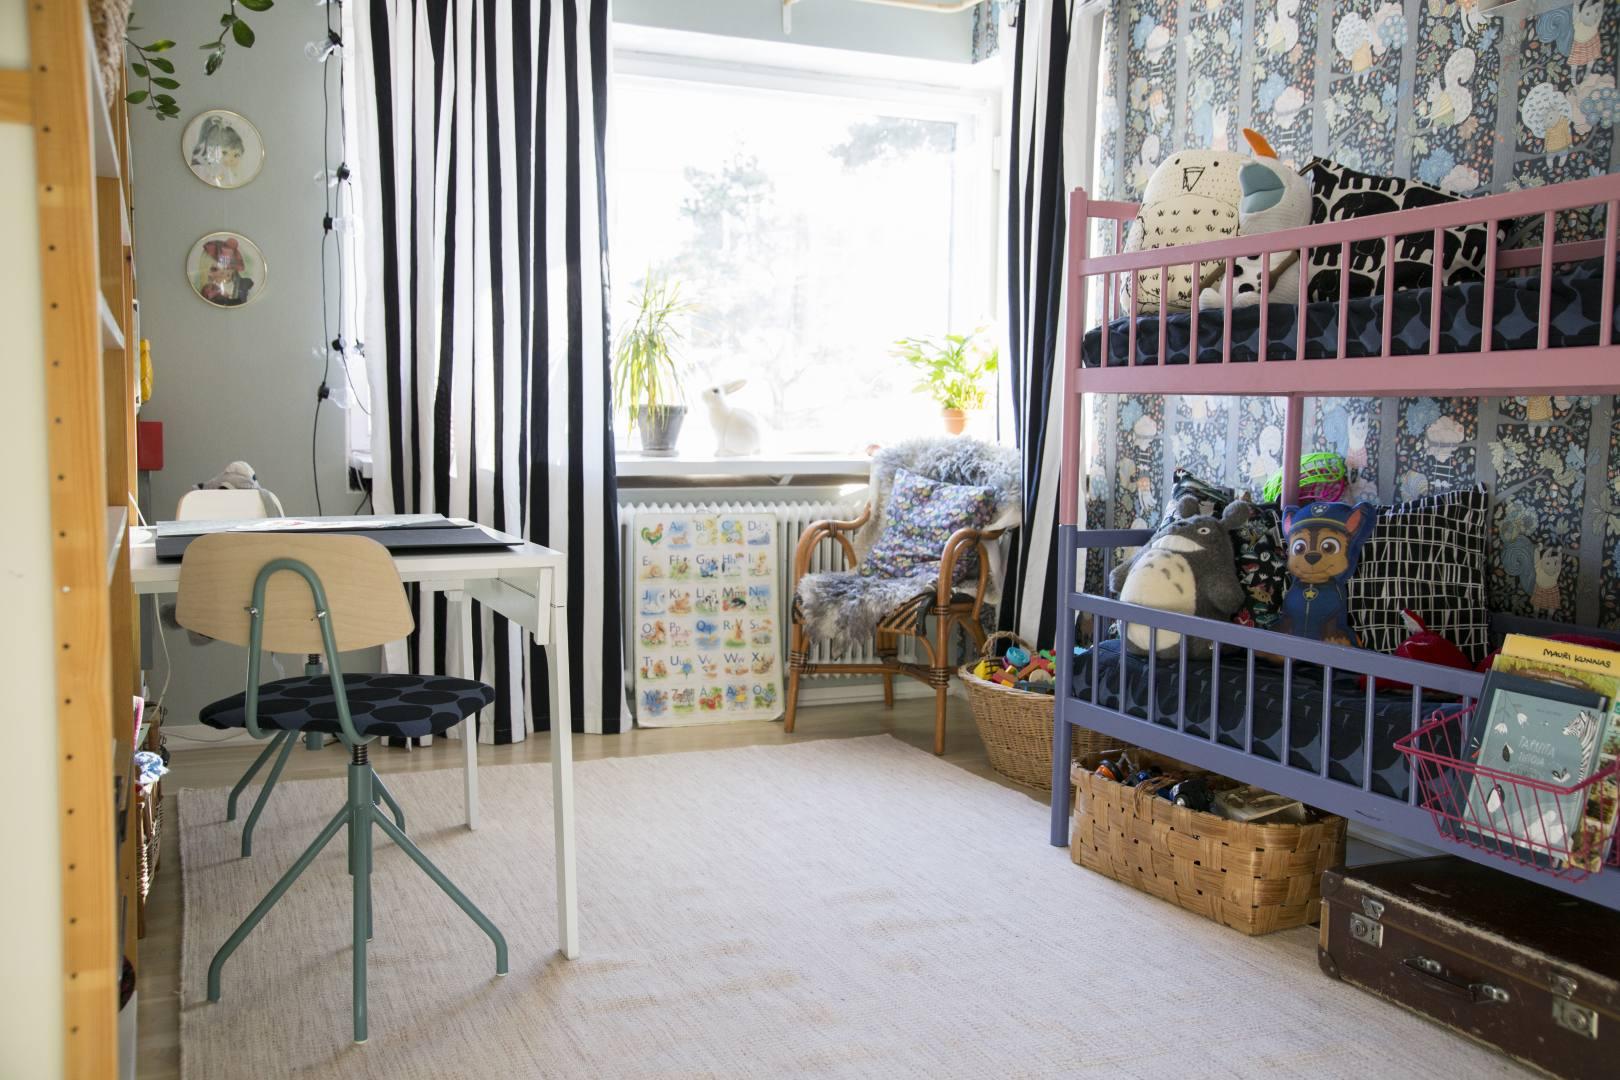 ©Lahiomutsi Lastenhuone Kidsroom Childrens Room Remontti Tapetti BarasTapeter Scandinavian Desigingers Mini, 6252 Charlie Linen Jade Lundia Entisointi-3843